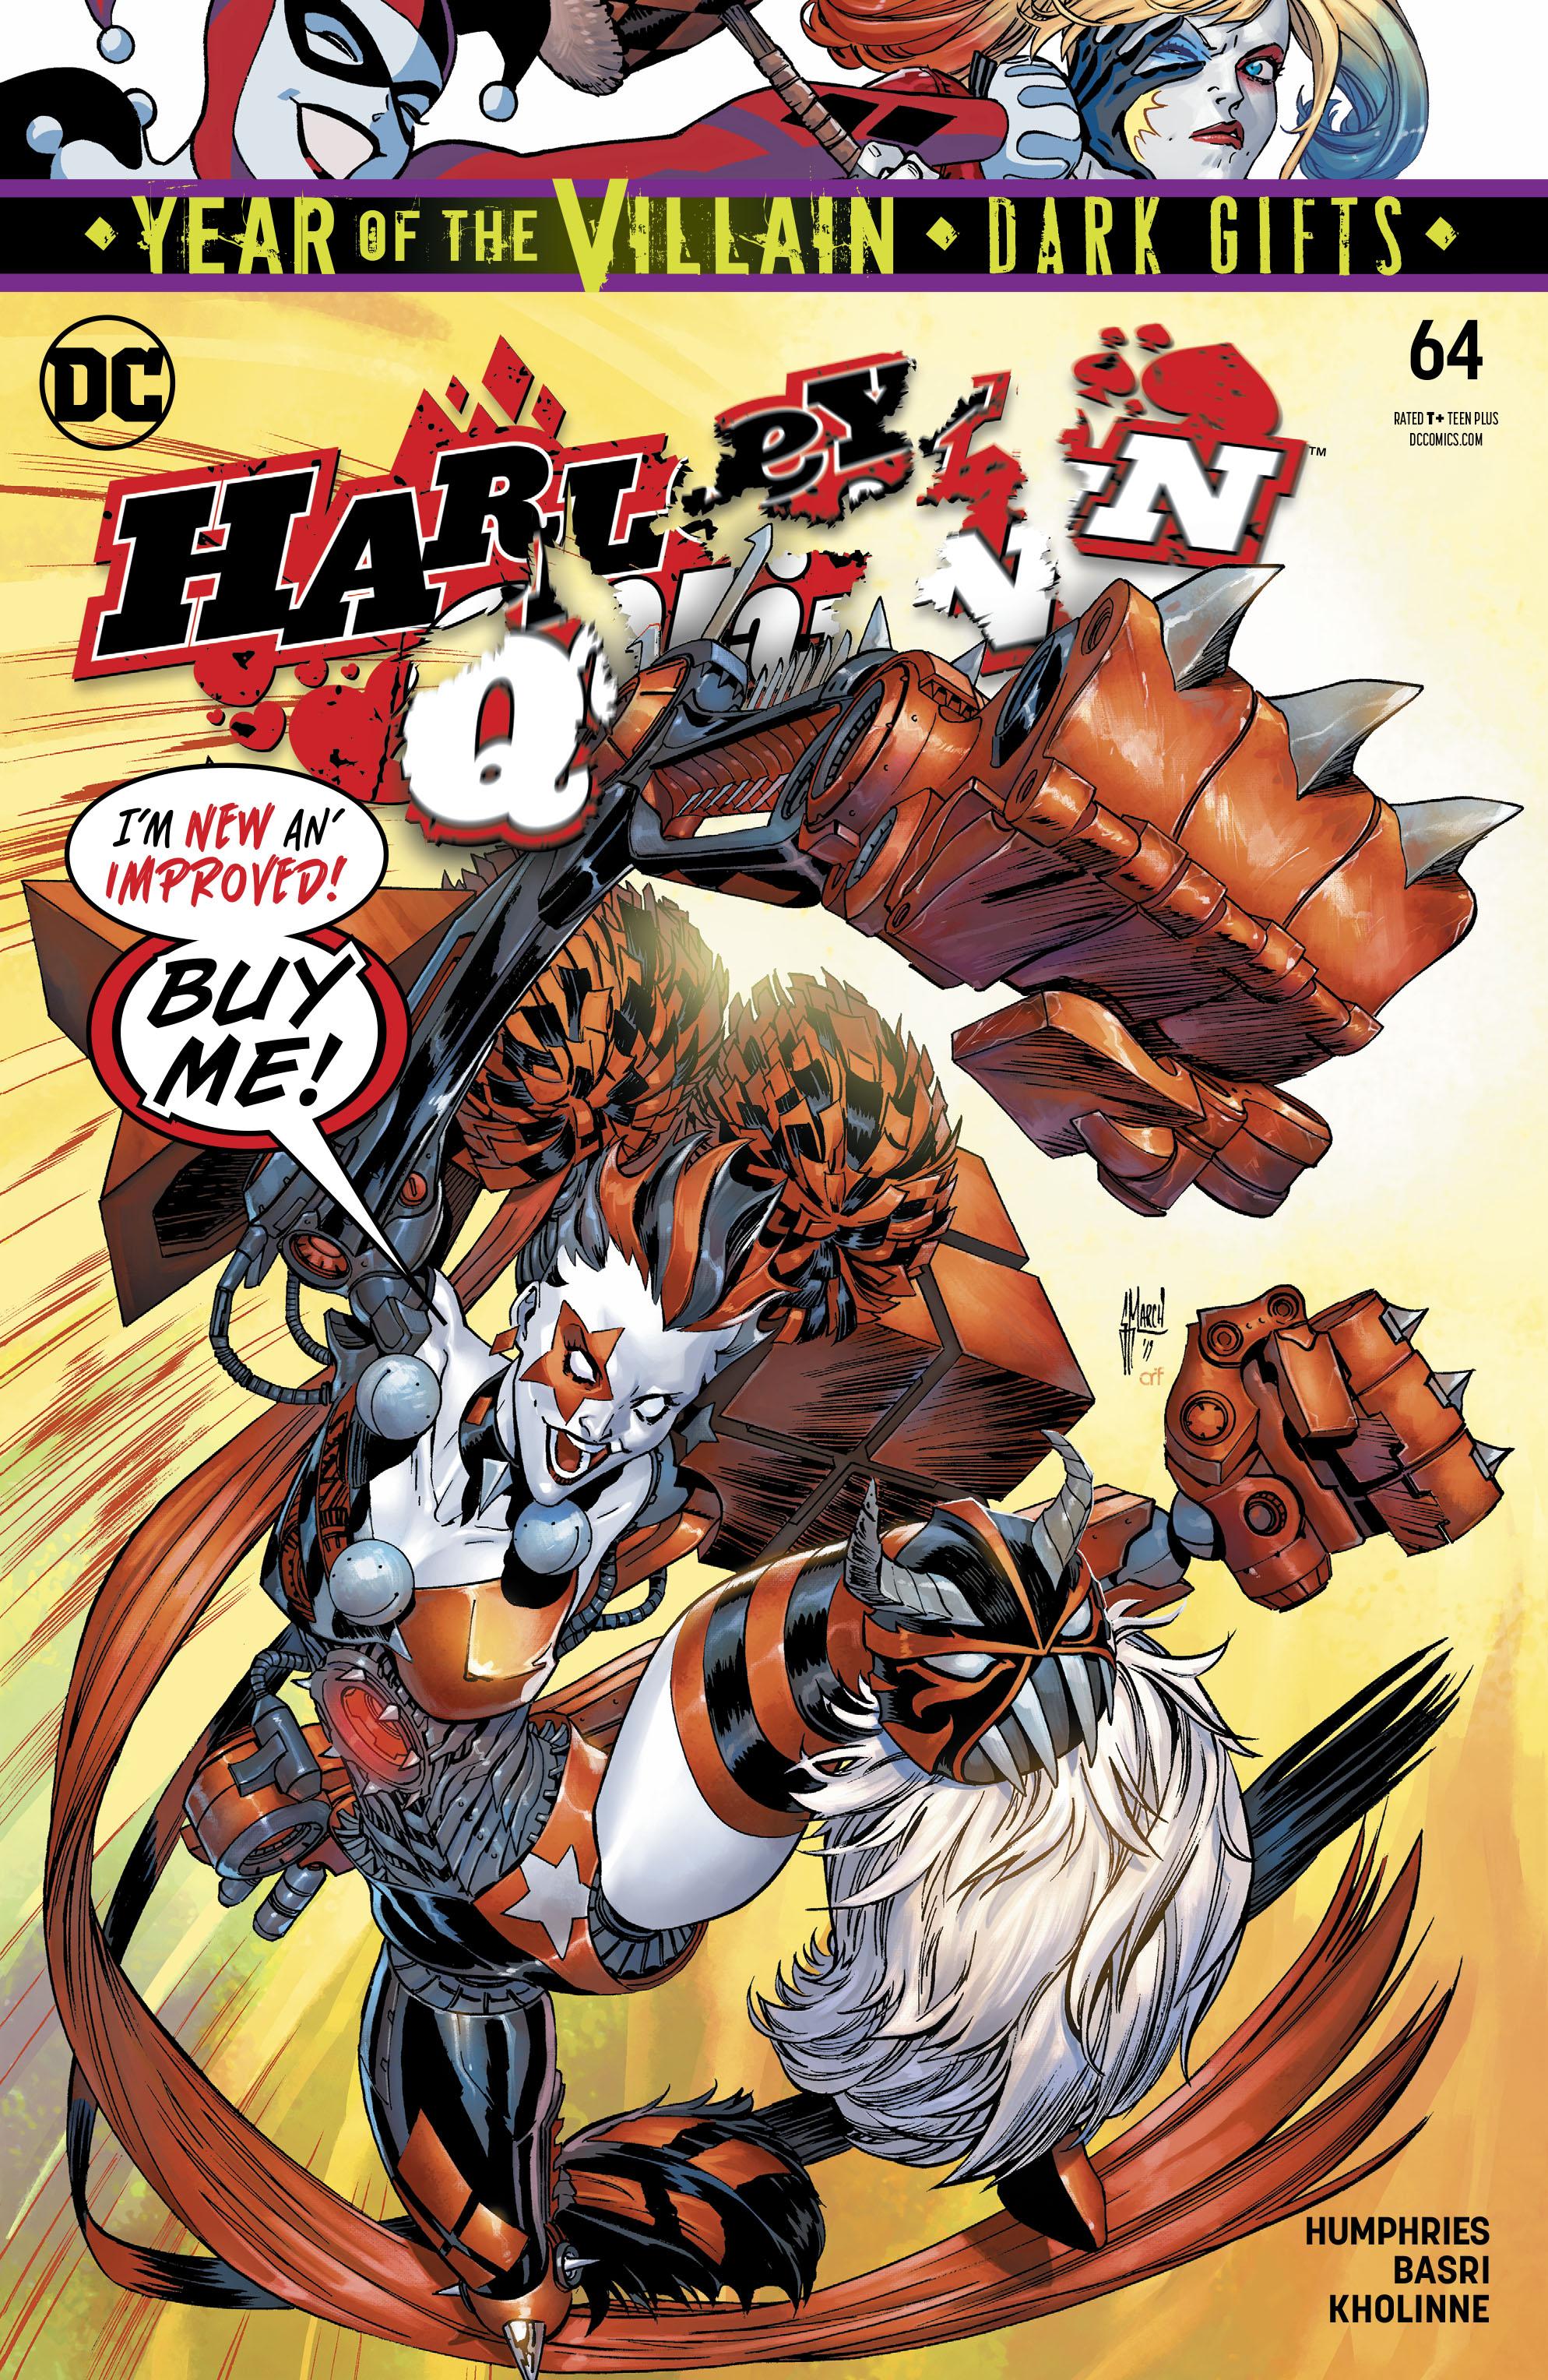 DC COMICS//2019 GUILLEM MARCH MAIN COVER HARLEY QUINN #64